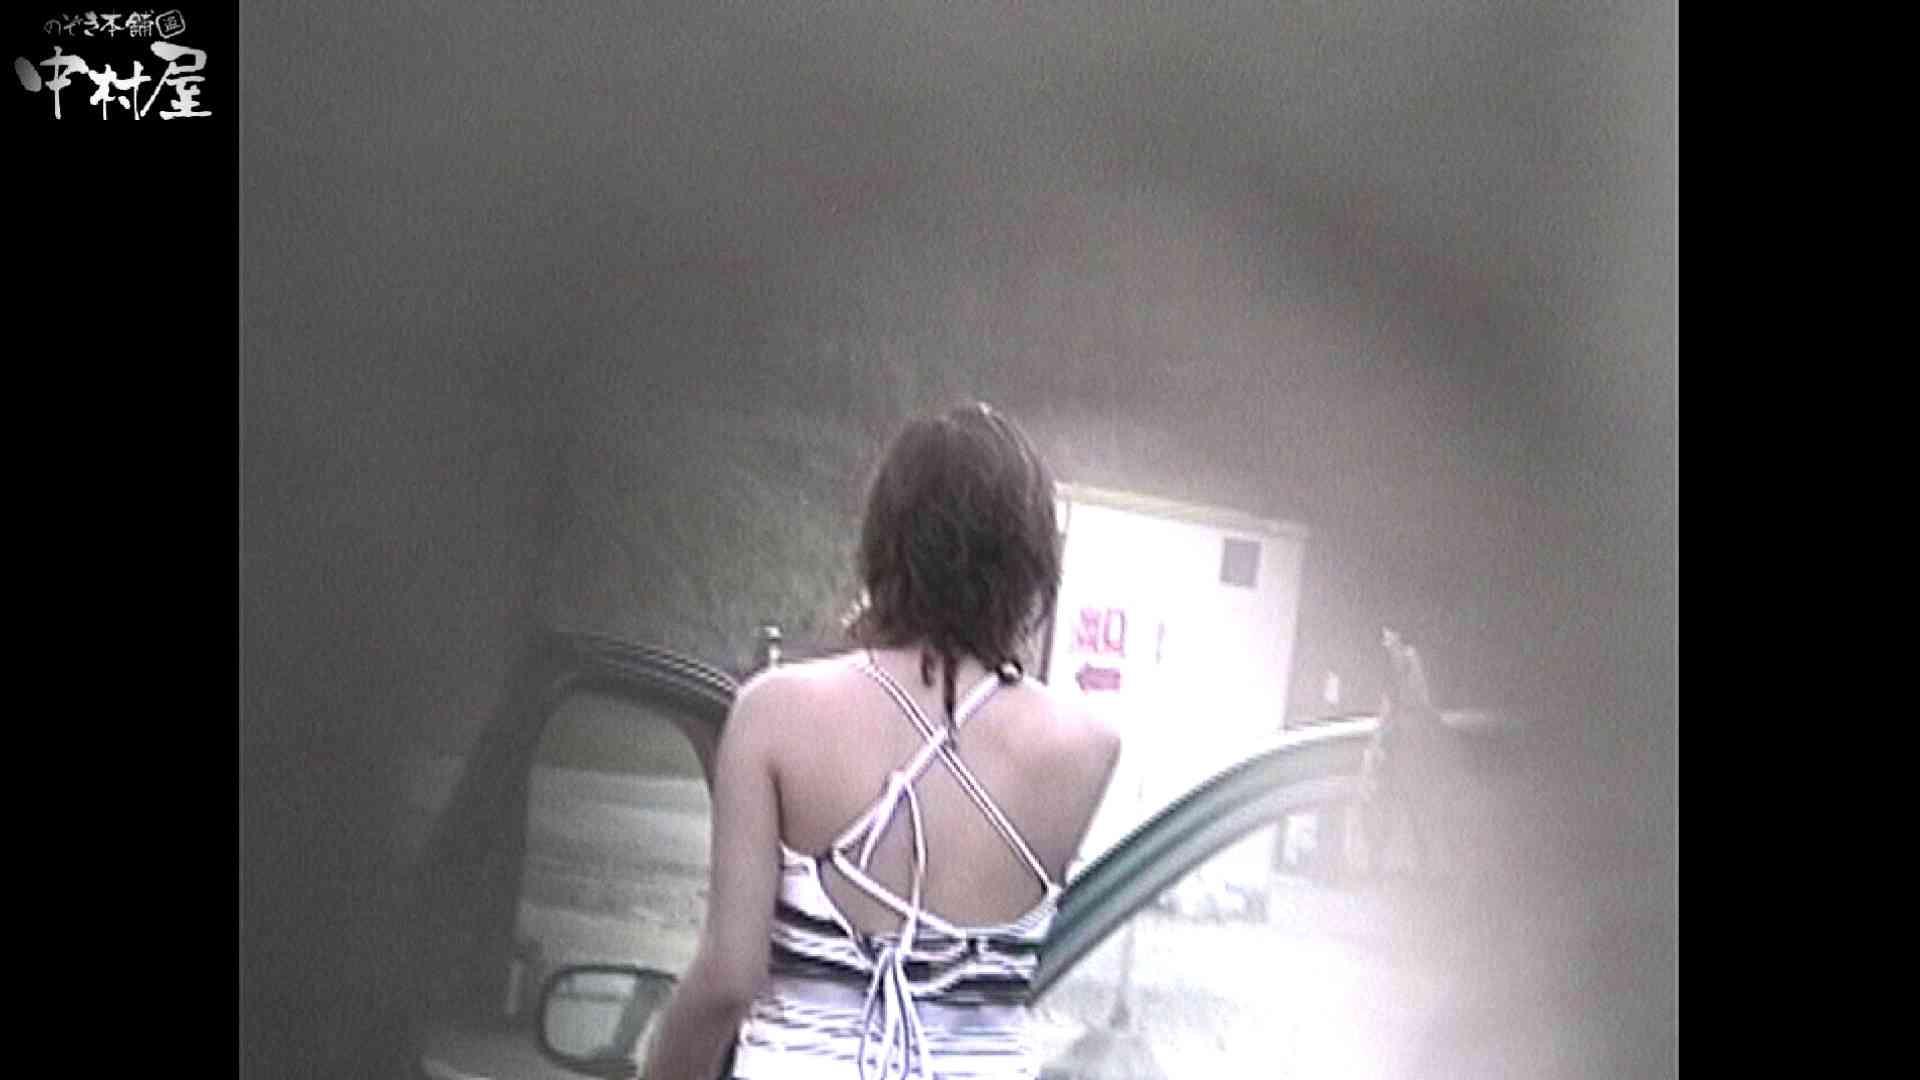 No.16 アニマル柄の水着 レースのパンツにナプキンを装着する金髪お姉さん ナプキン  63連発 52